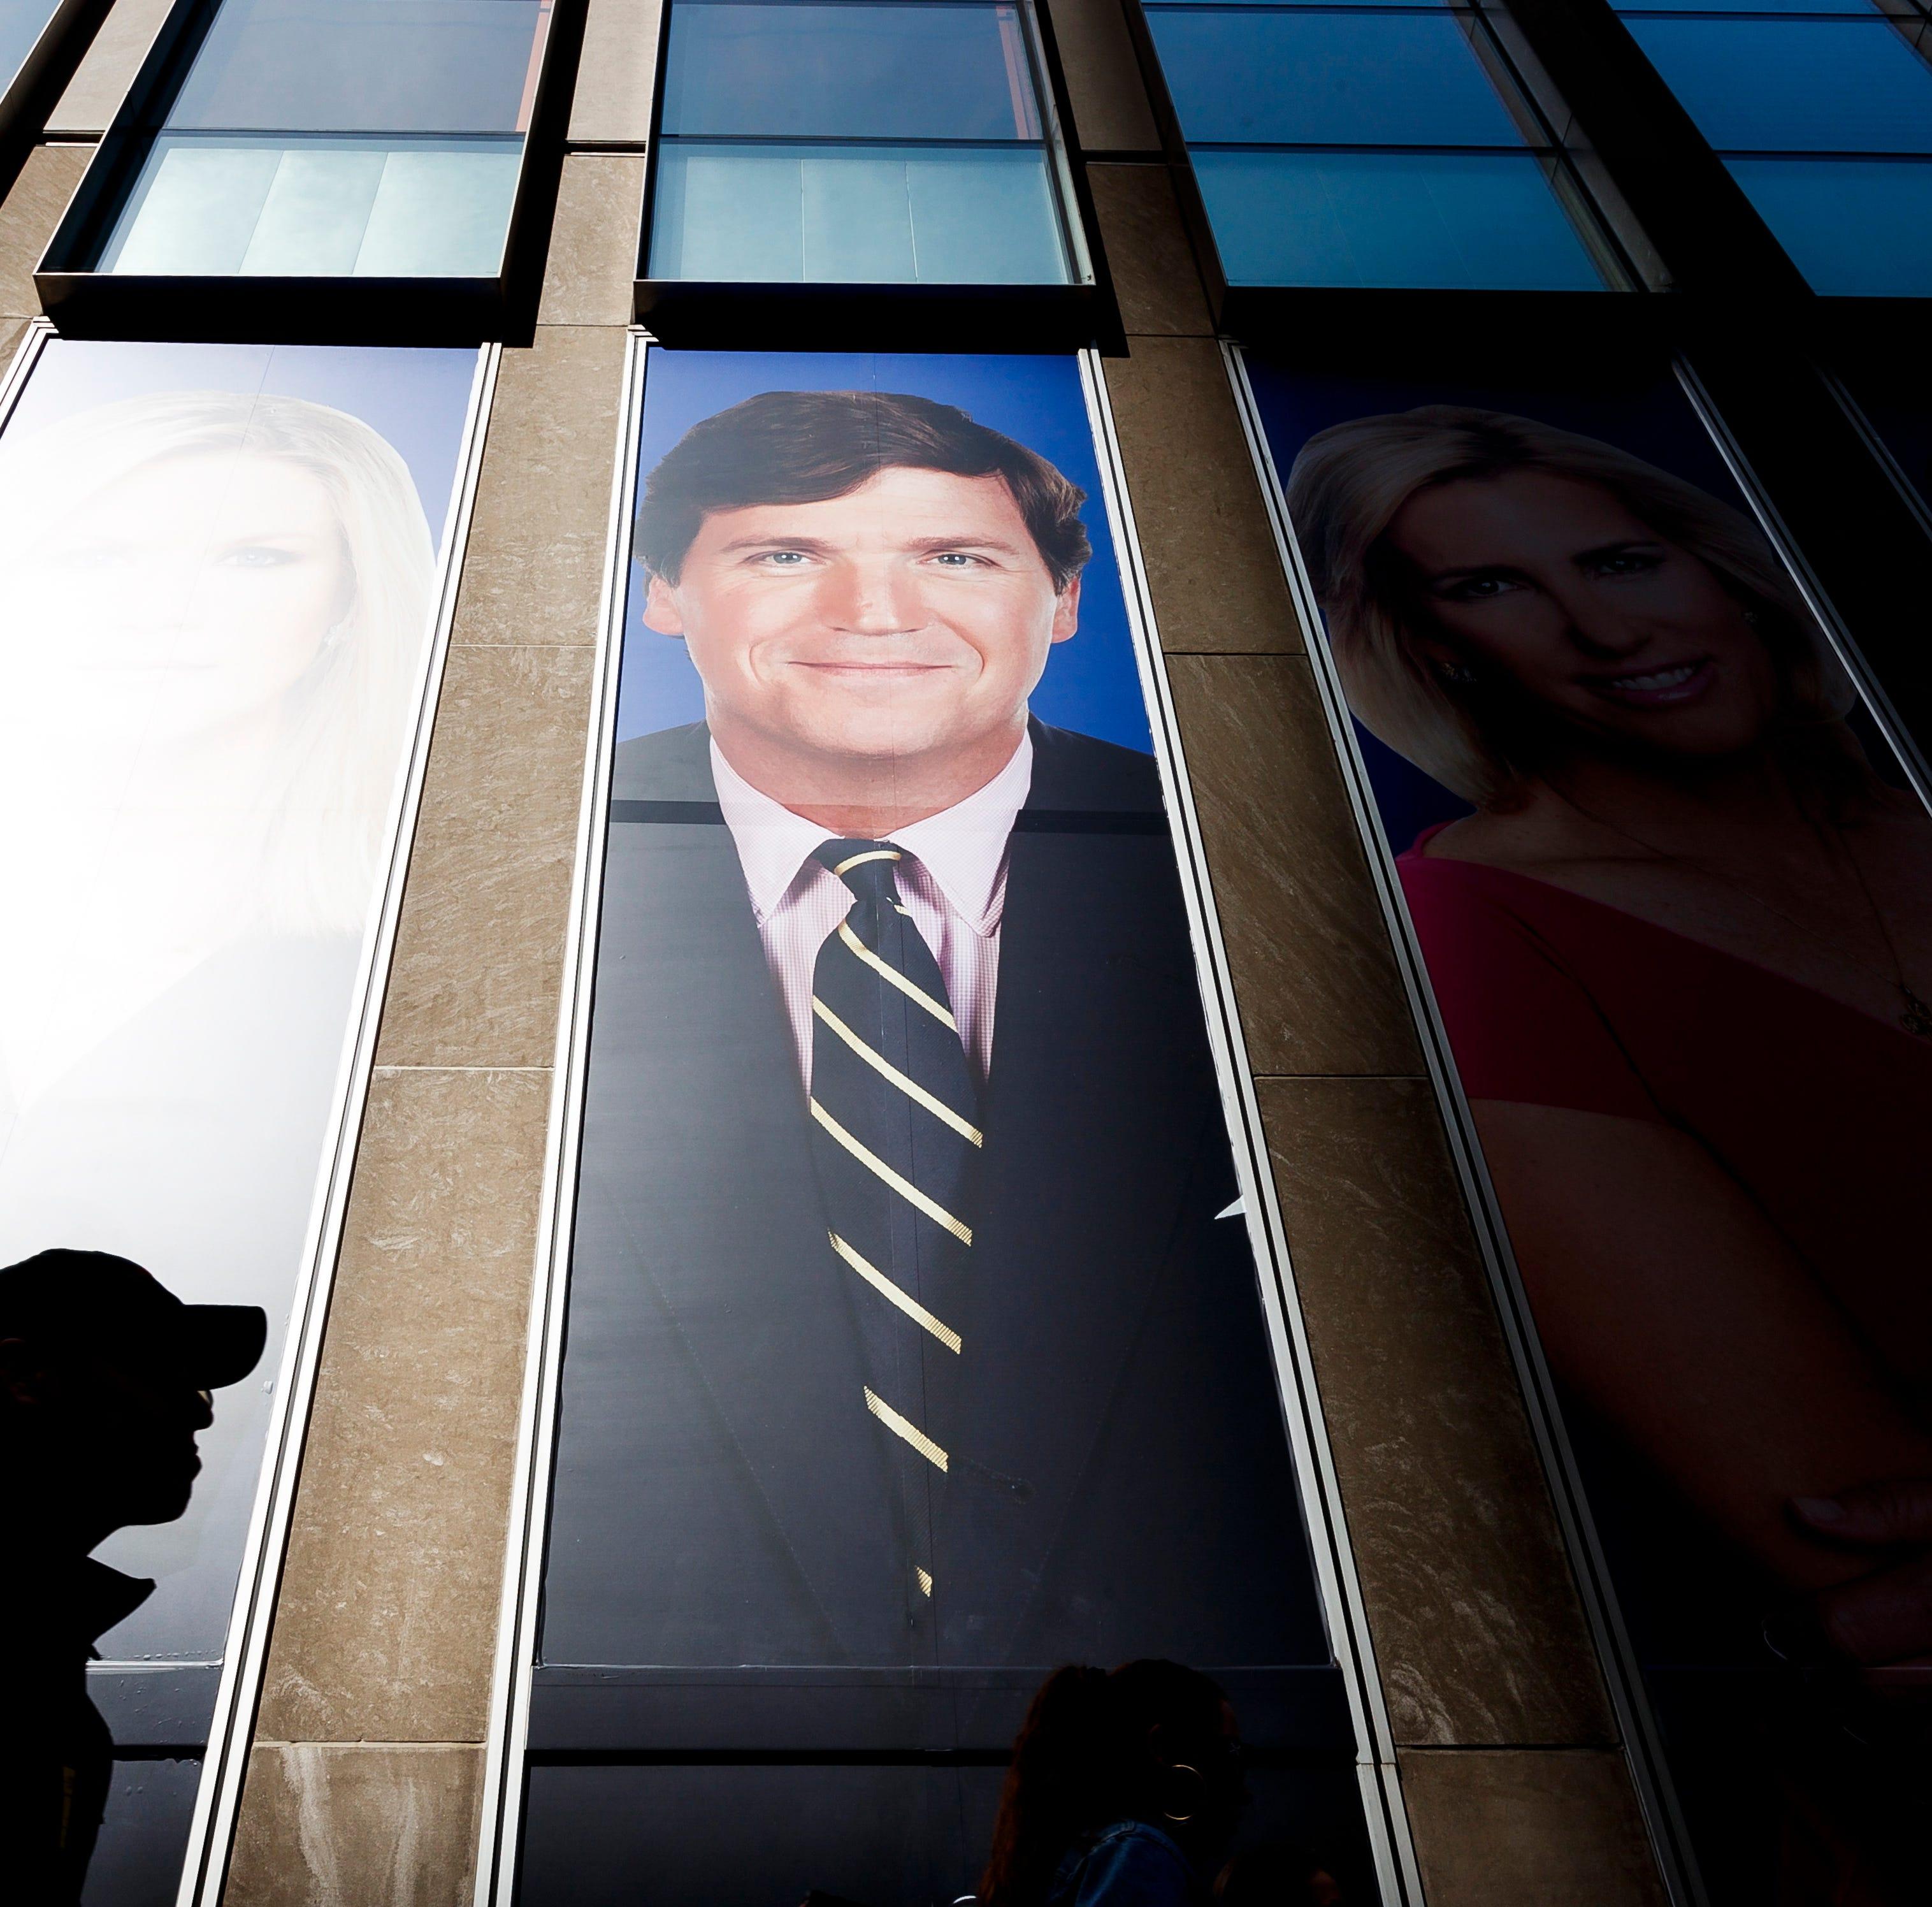 Tucker Carlson & Bubba the Love Sponge: Fox talker wise to skip apology to cry bullies